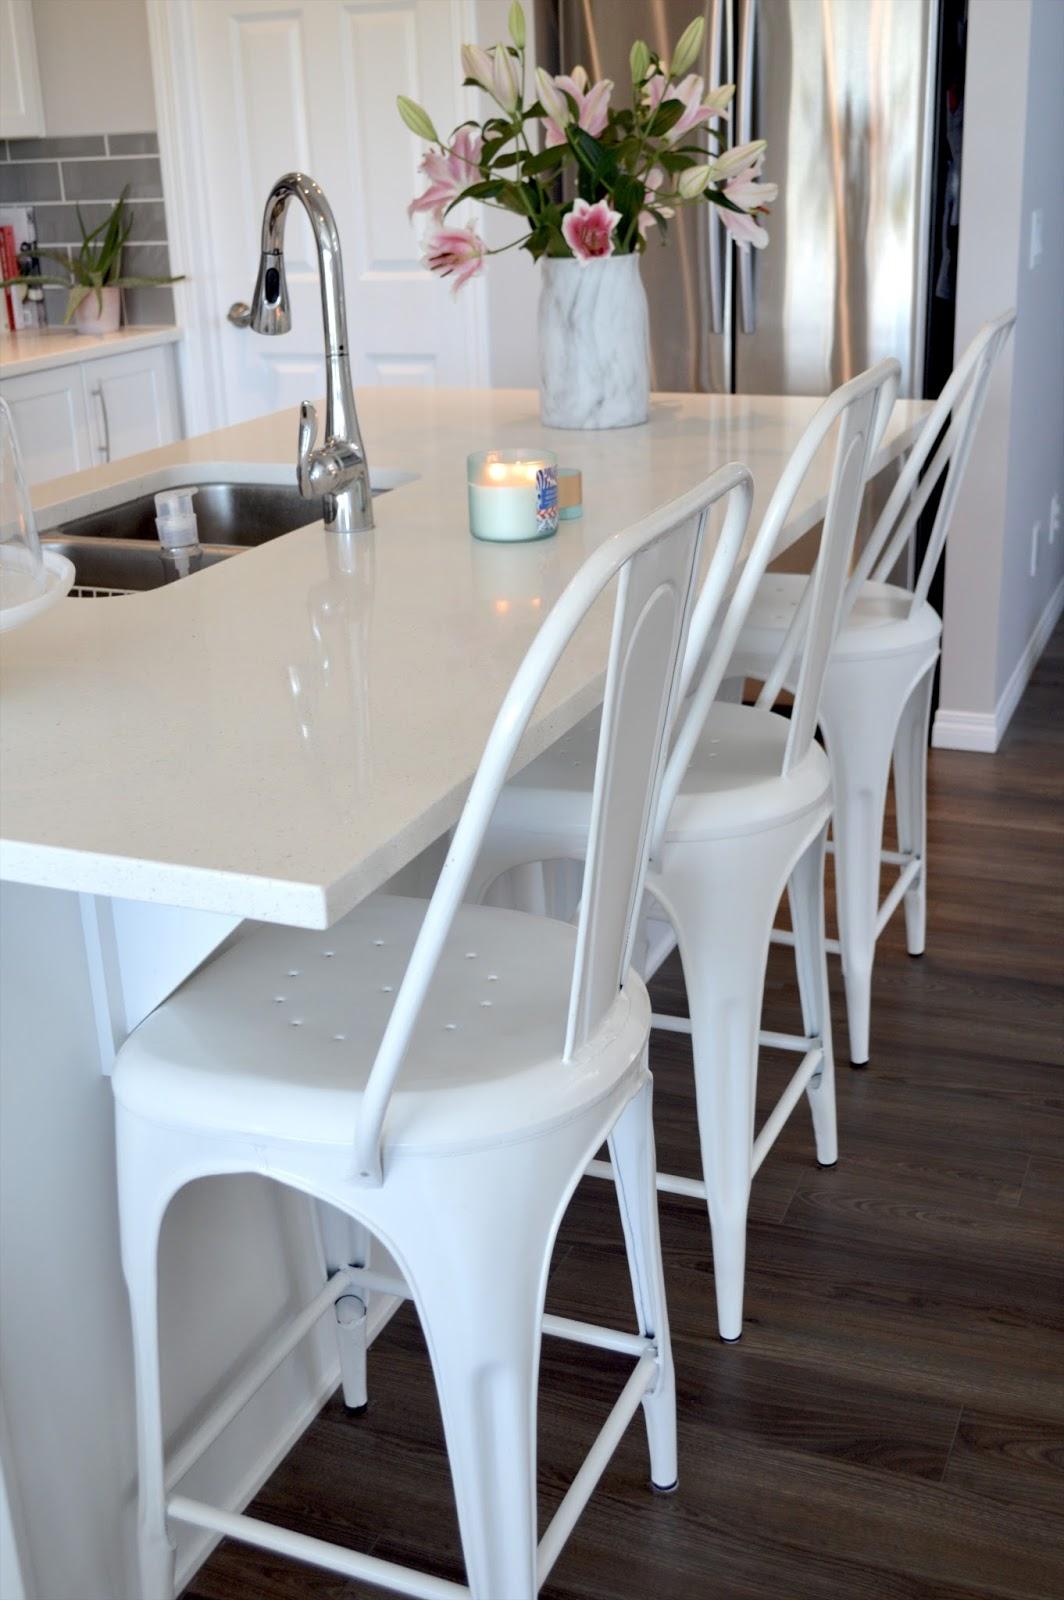 Pleasant Earl Grey Cowboy Boots Diapers My Kitchen Uwap Interior Chair Design Uwaporg